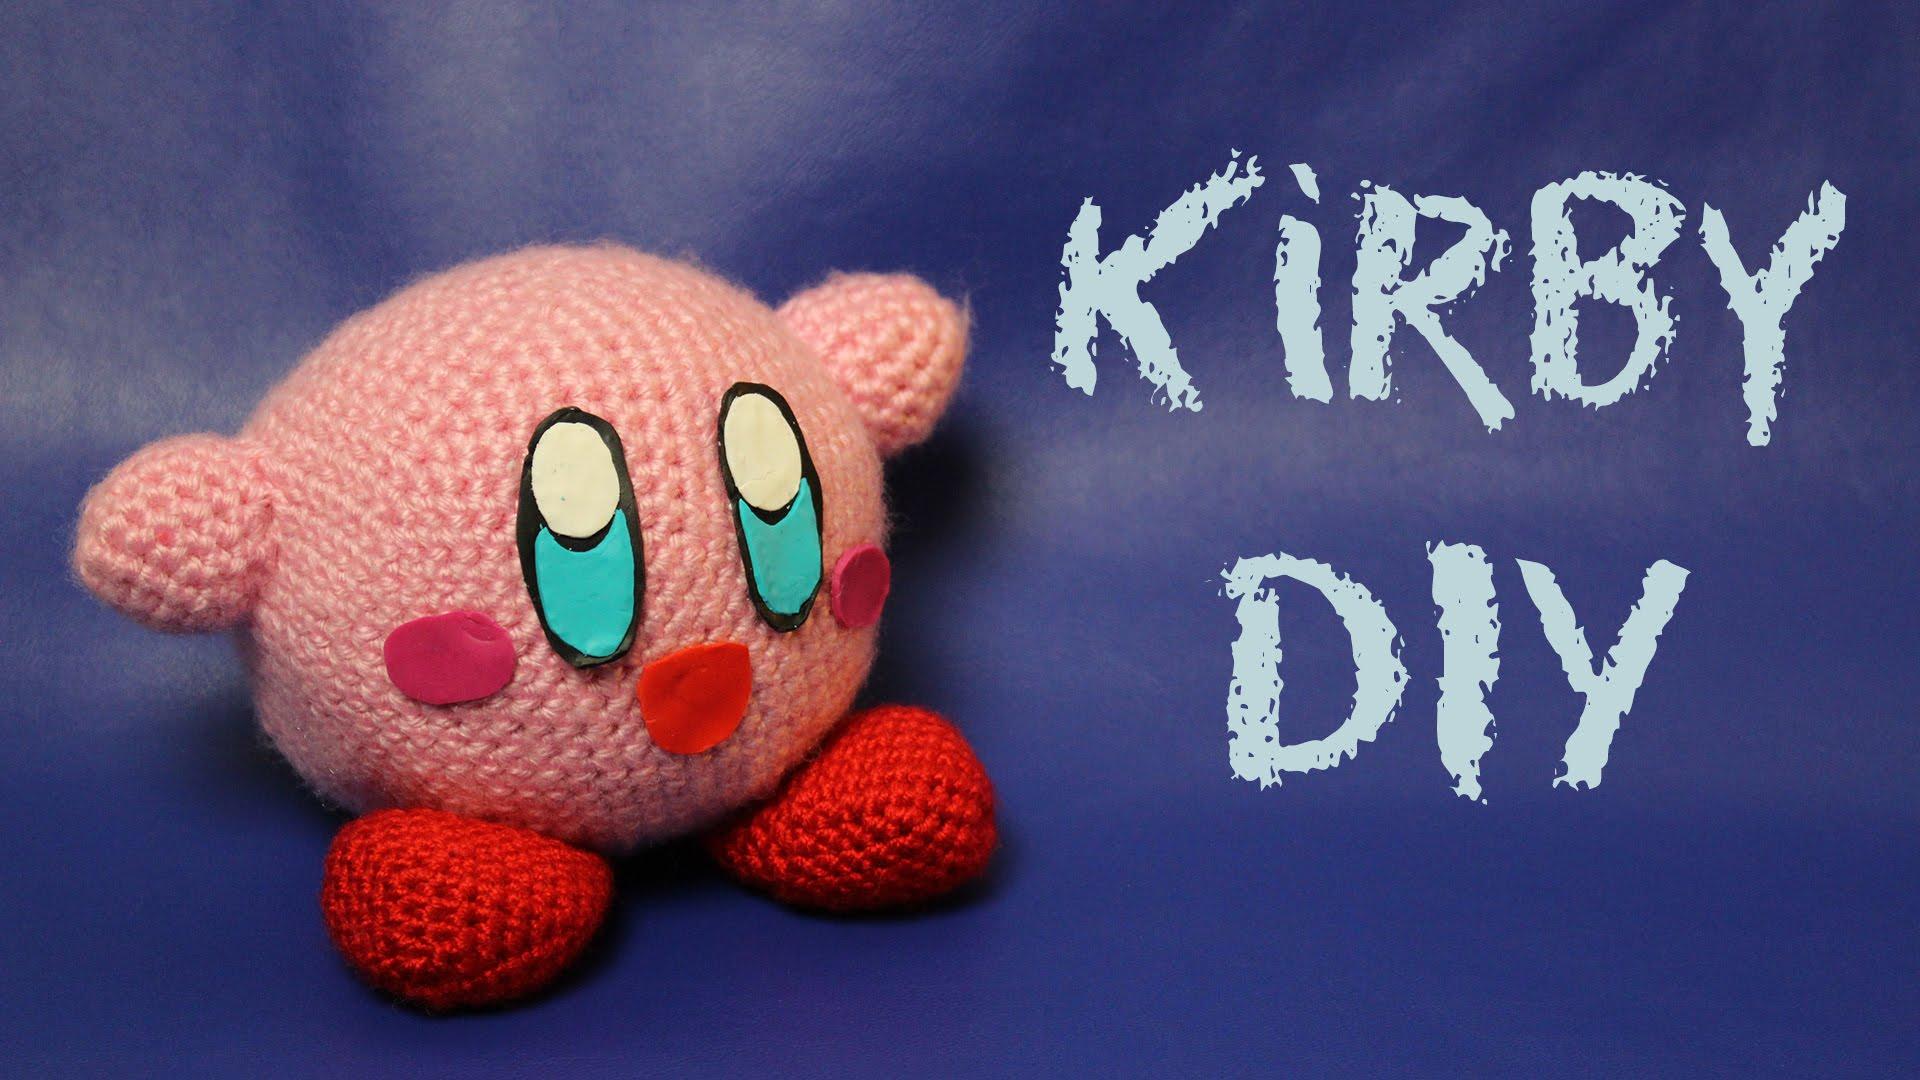 Kirby Nintendo Justmikode Gratis Anleitungen Zum Häkeln